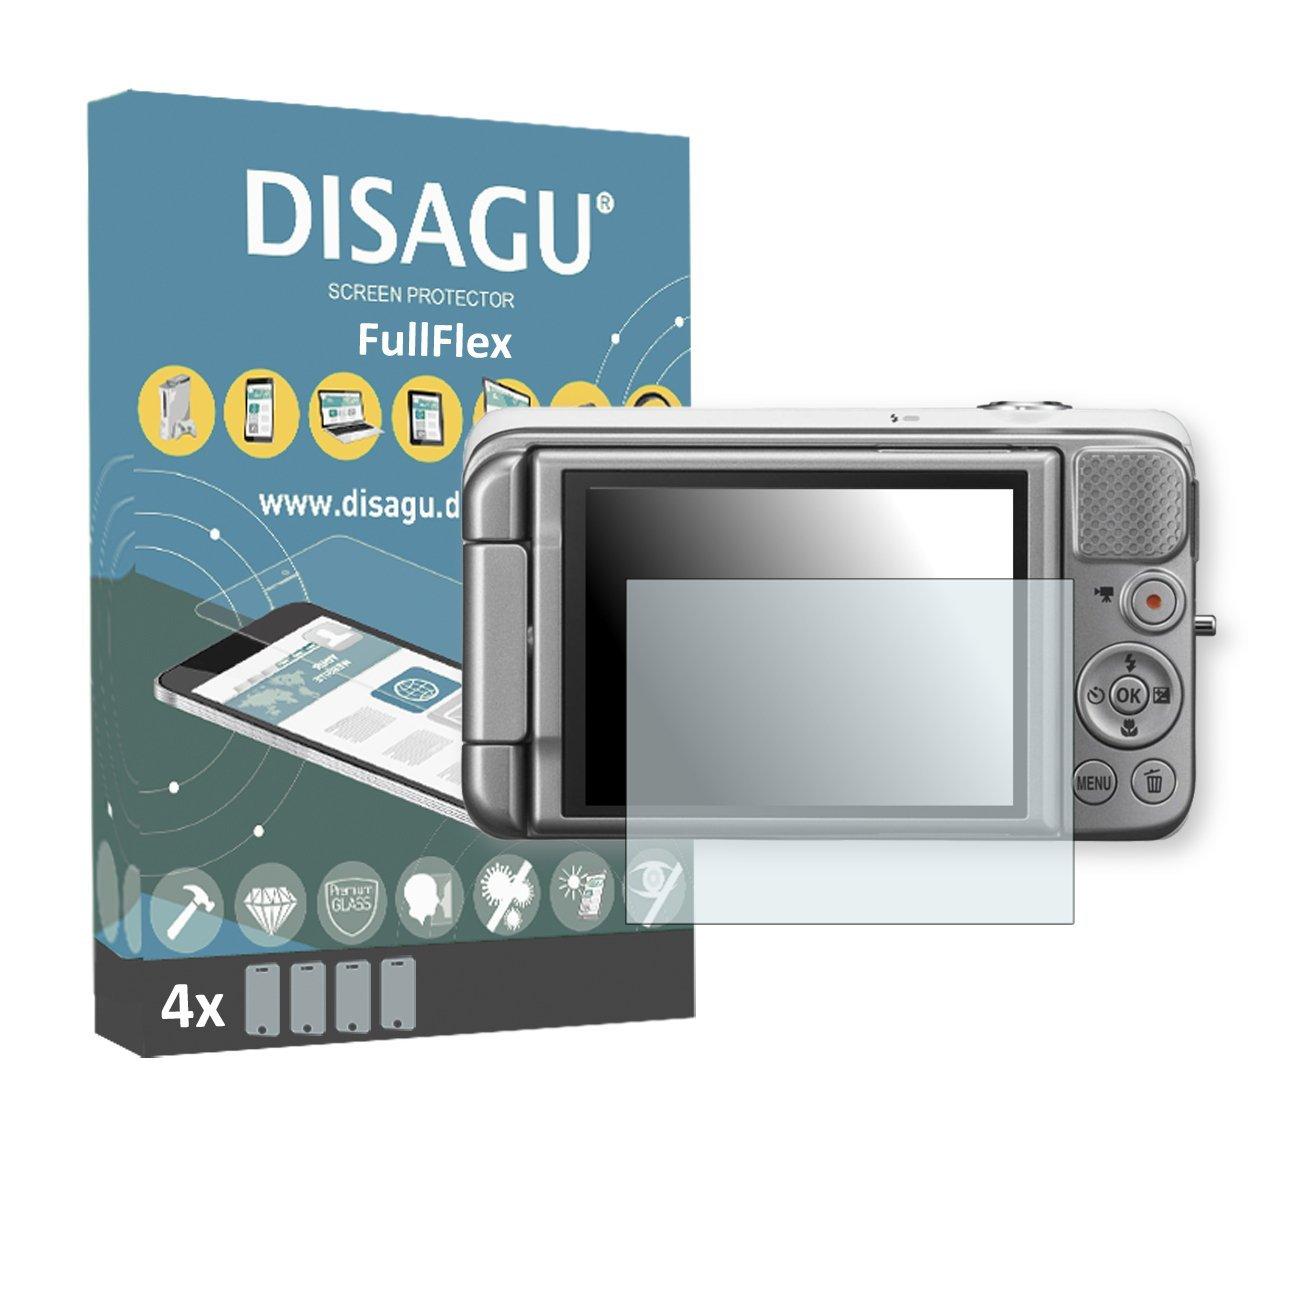 Amlogic Aml8726 Mxs Tablet Firmware Download cheap tablet jxd s6600, find tablet jxd s6600 deals on line